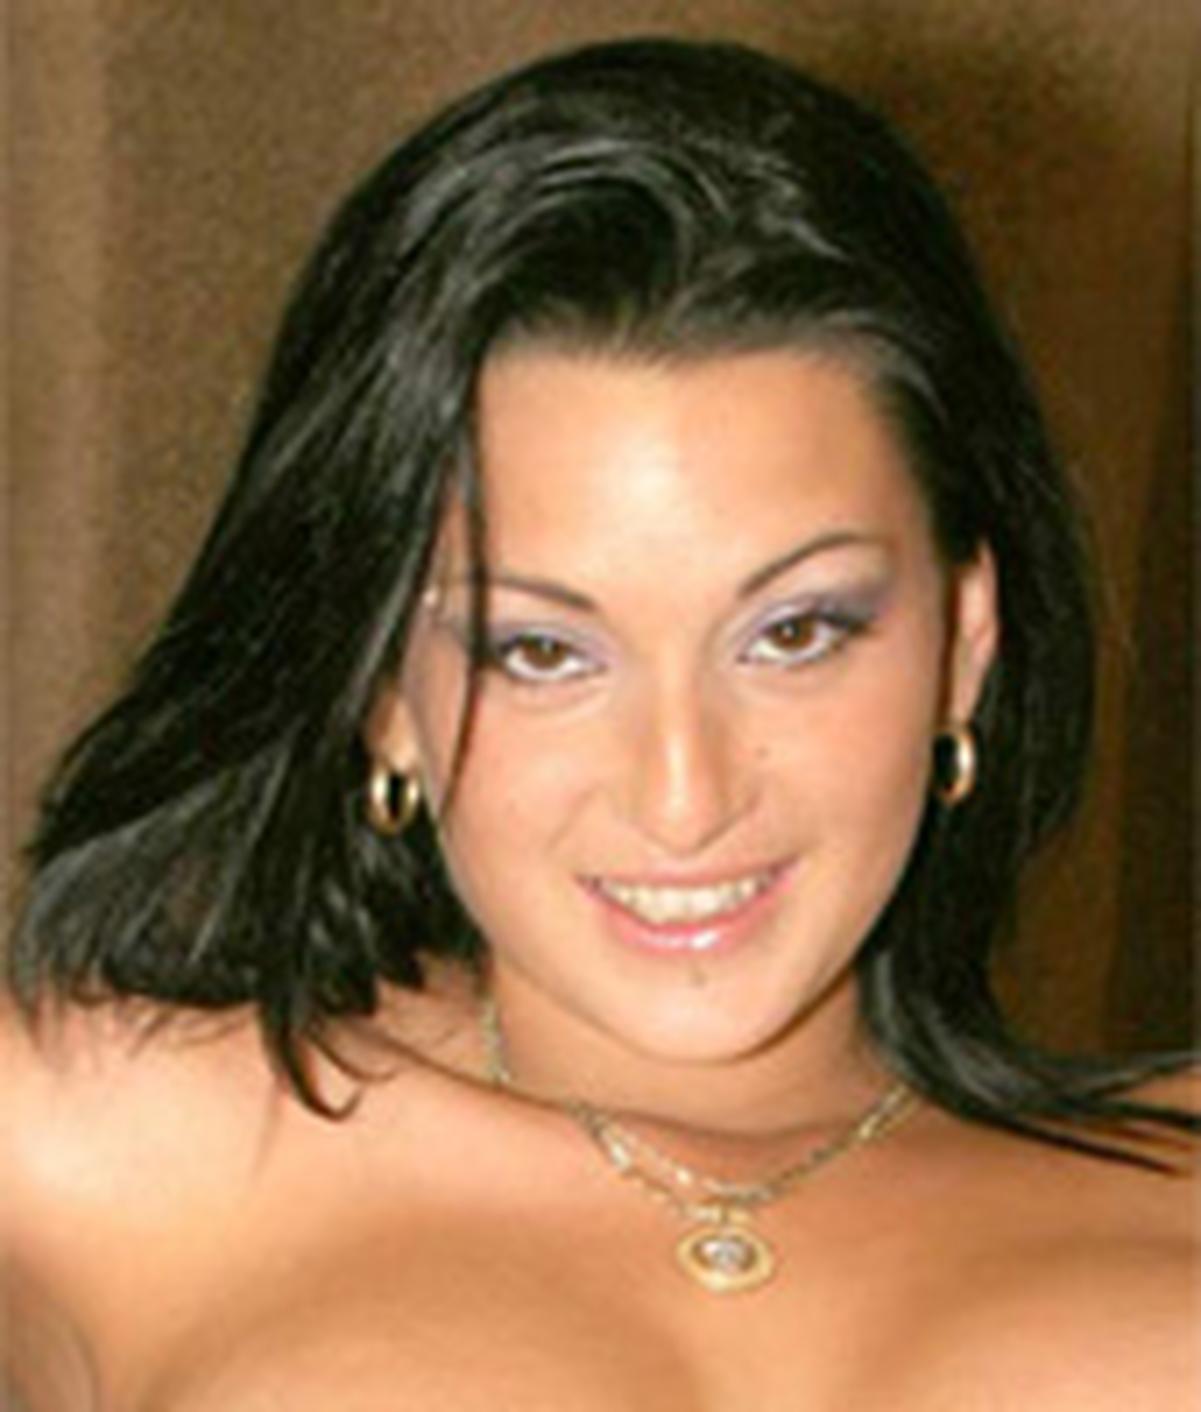 Mandy Allison